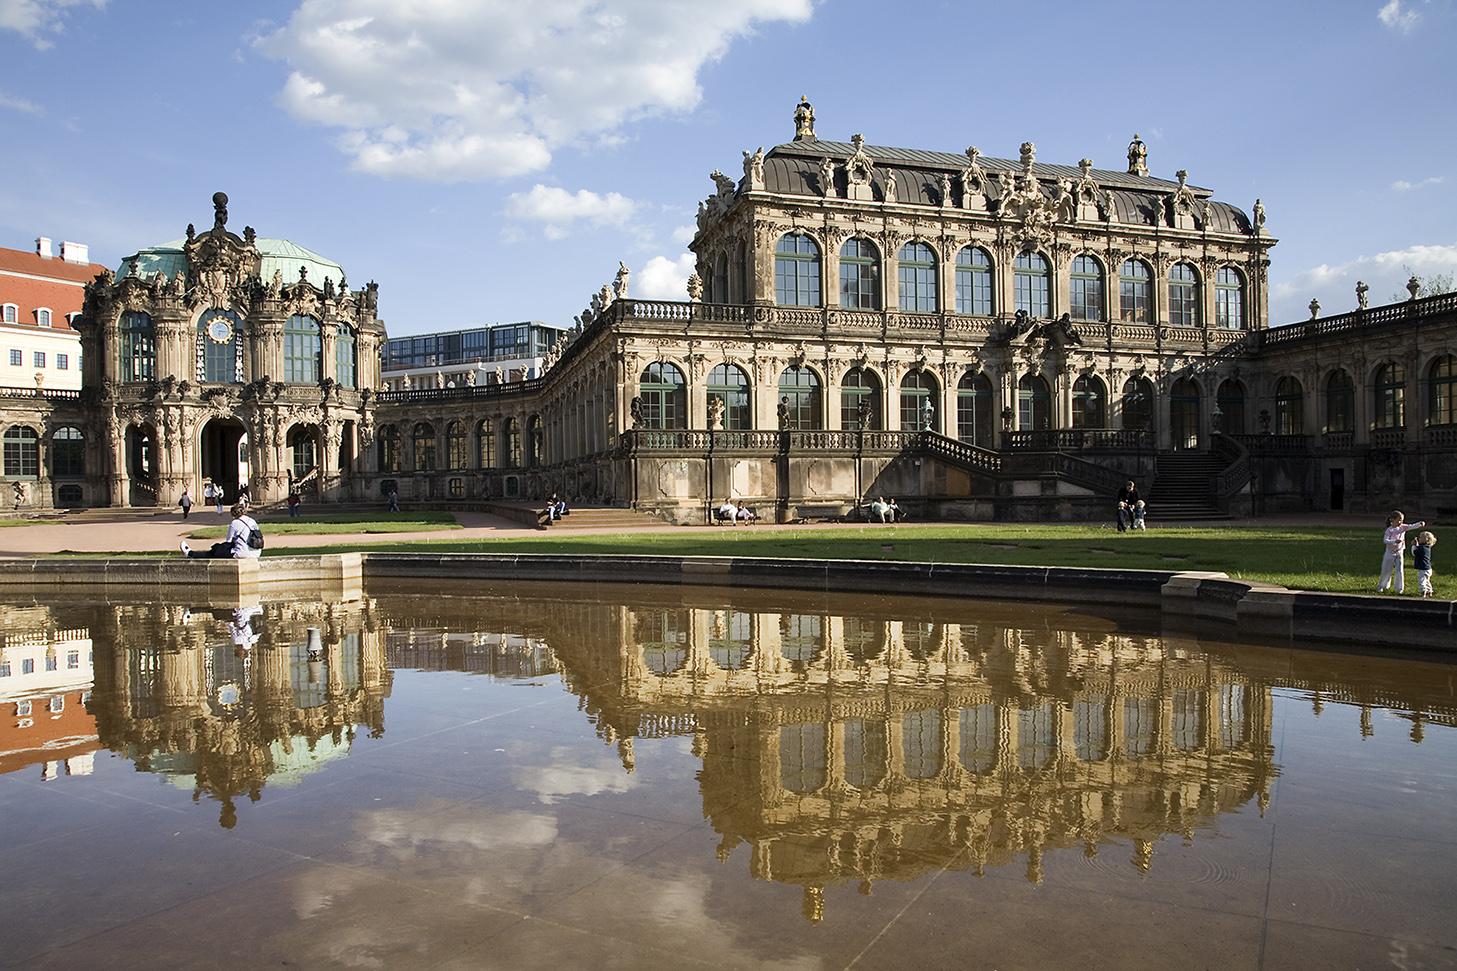 Inner court of the Staatliche Kunstsammlungen Dresden Gemäldegalerie Alte Meister in the Dresdner Zwinger Museum . With view of the Rampartpavilion and Glockenspielpavilion . Dresden, Germany